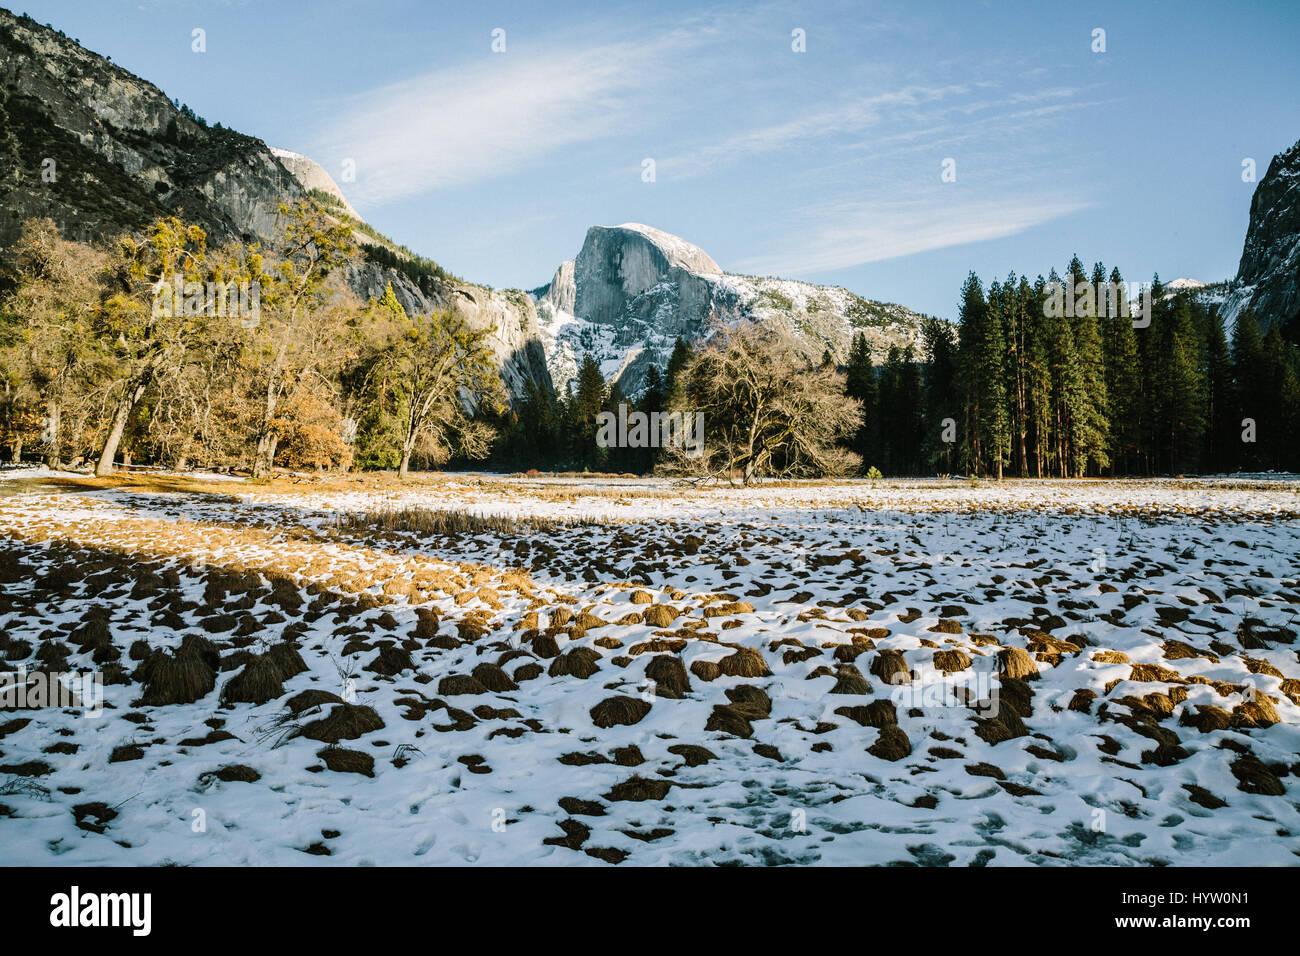 Valley View of Half Dome at Yosemite, California, USA - Stock Image